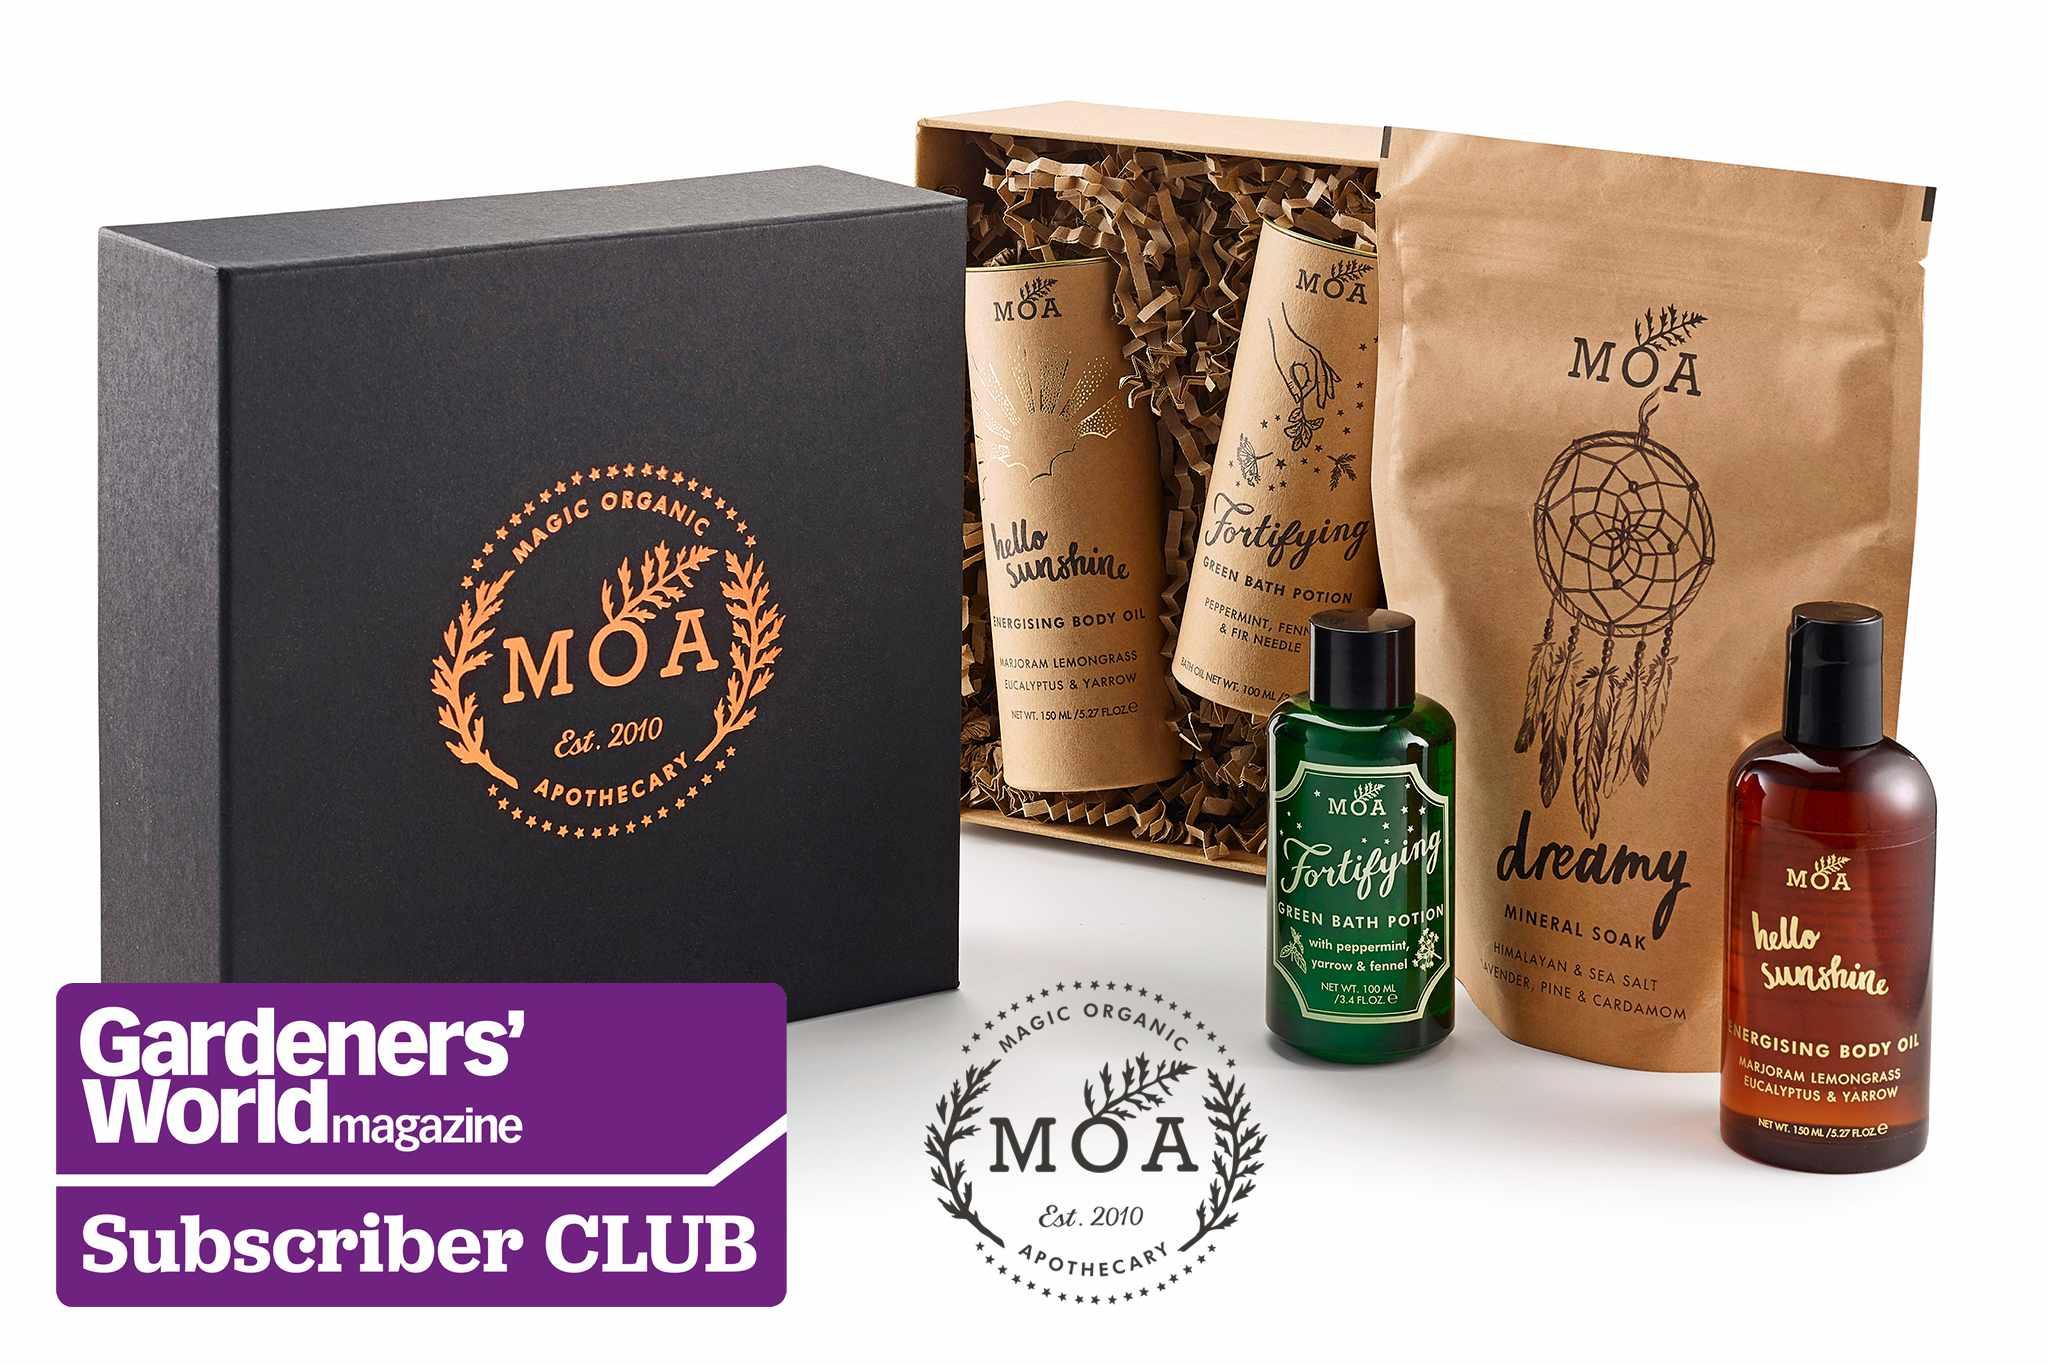 Win an MOA gift hamper